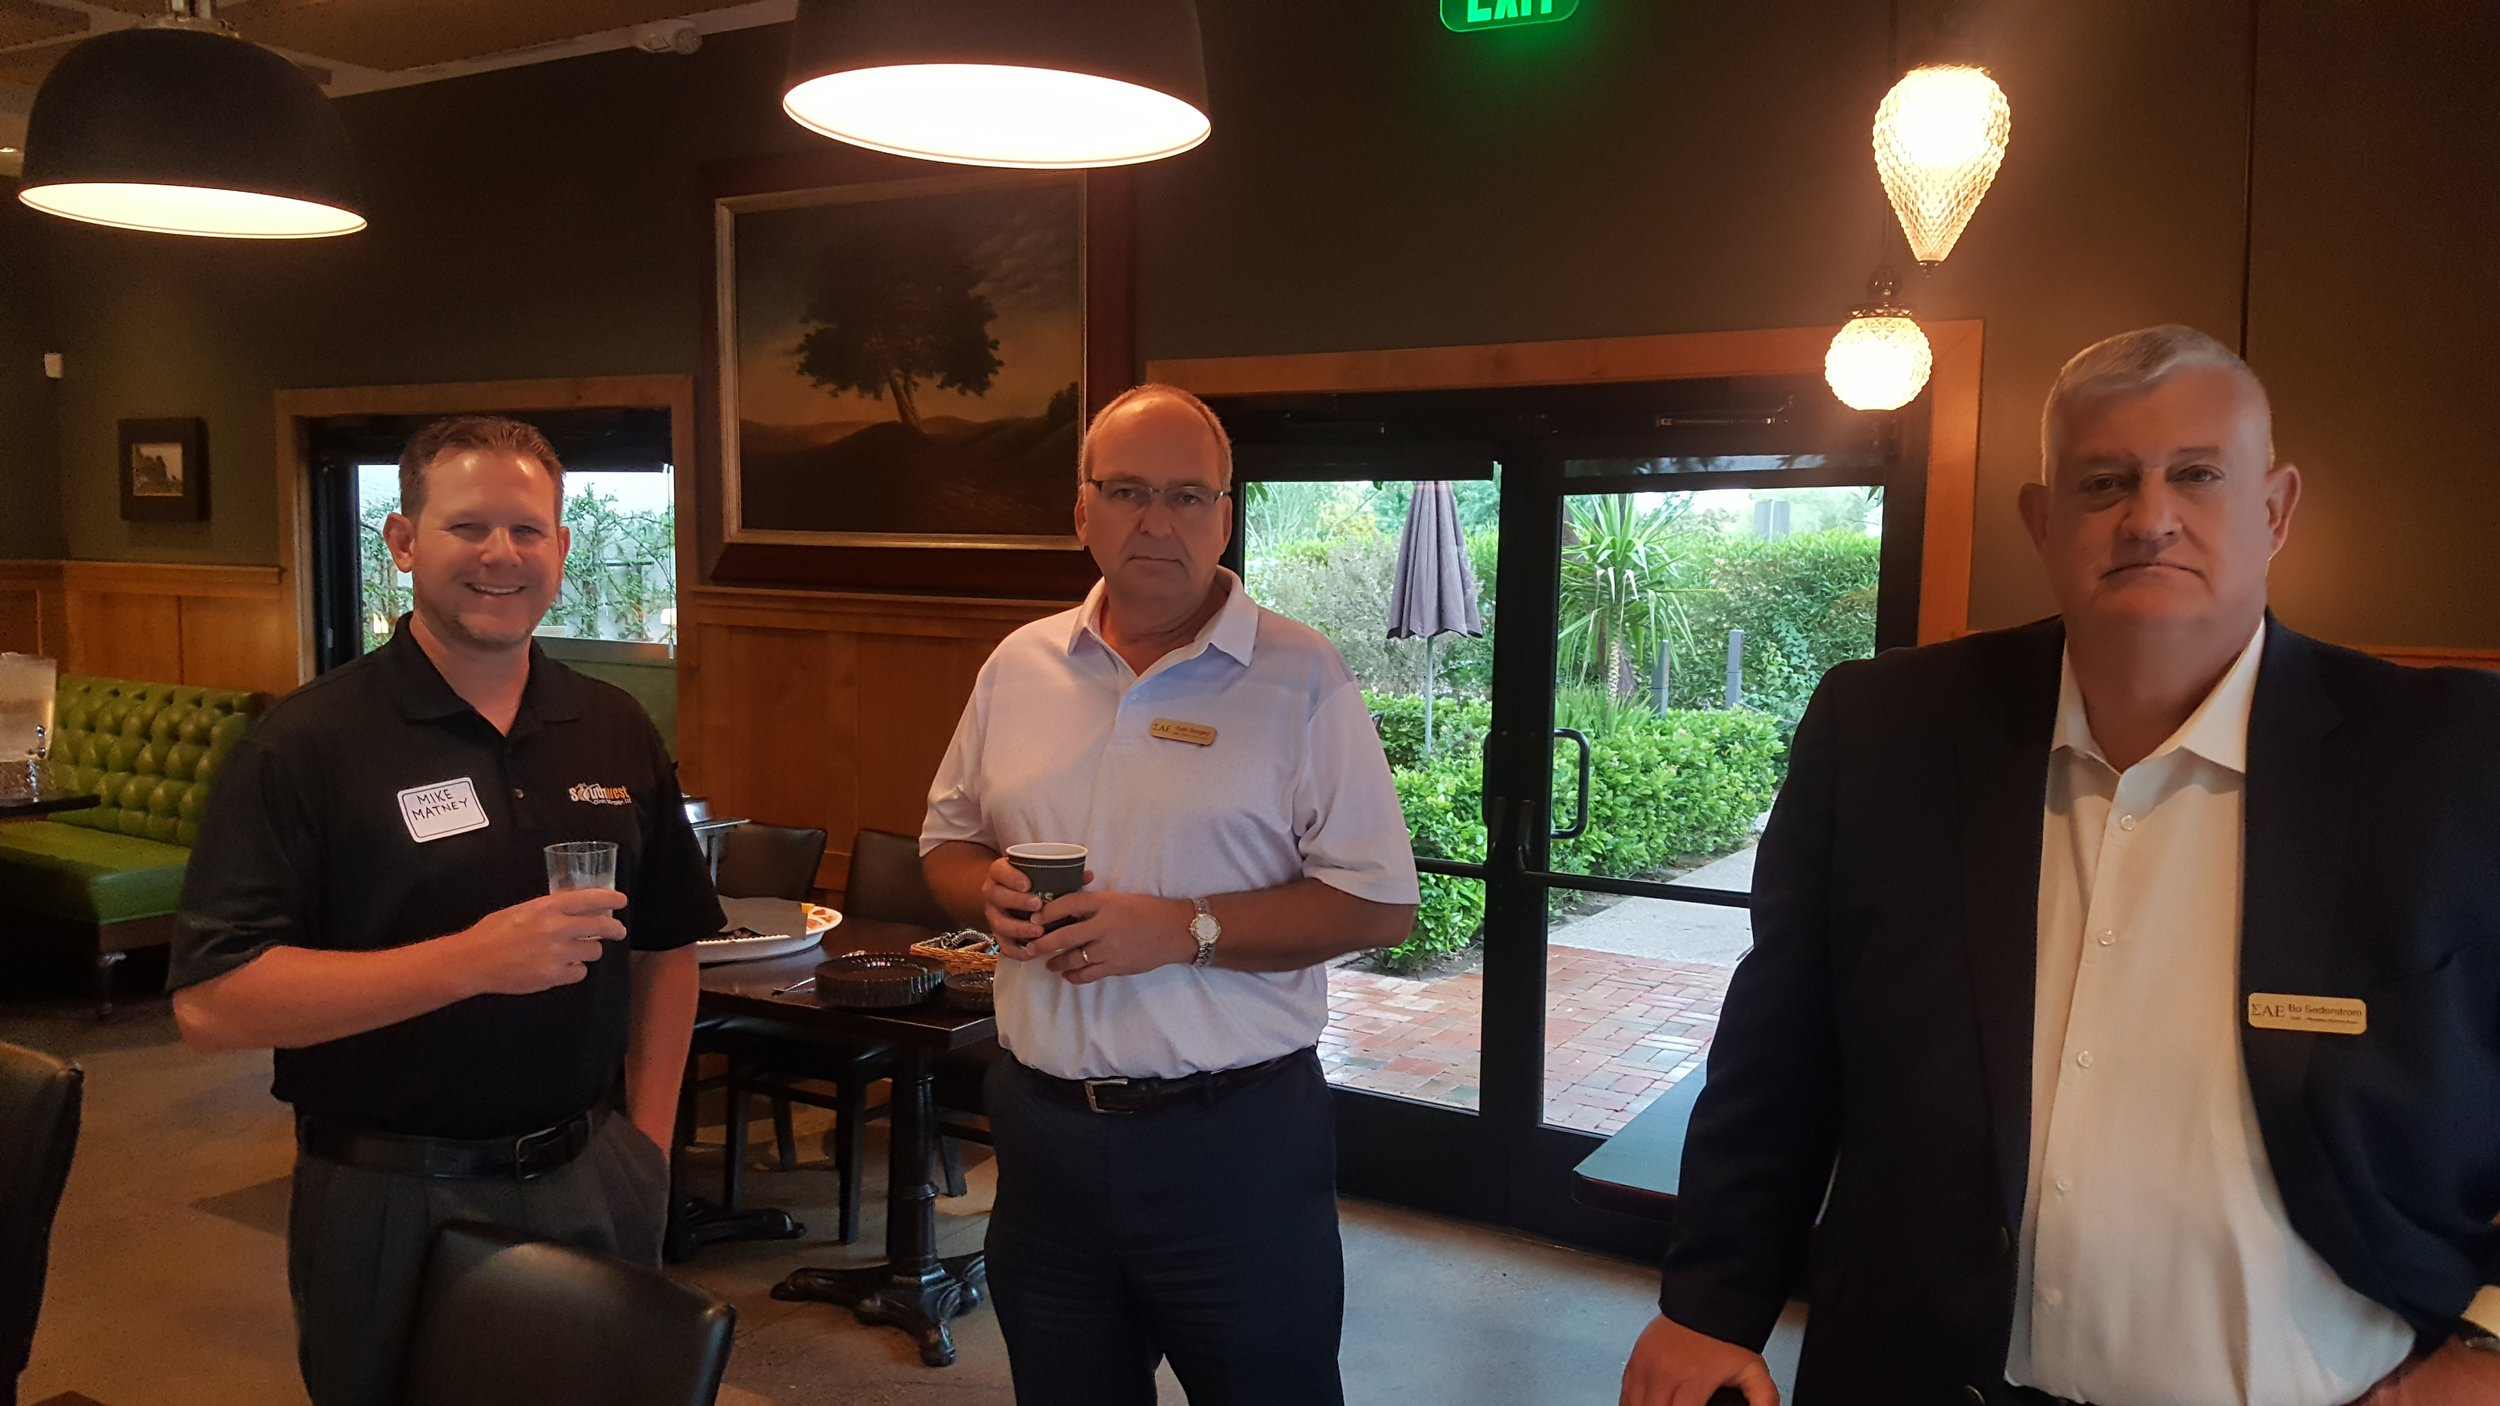 Mike Matney, MI Alpha (L), Todd Stingley NE L-P (C) and Bo Sederstrom AZ Gamma